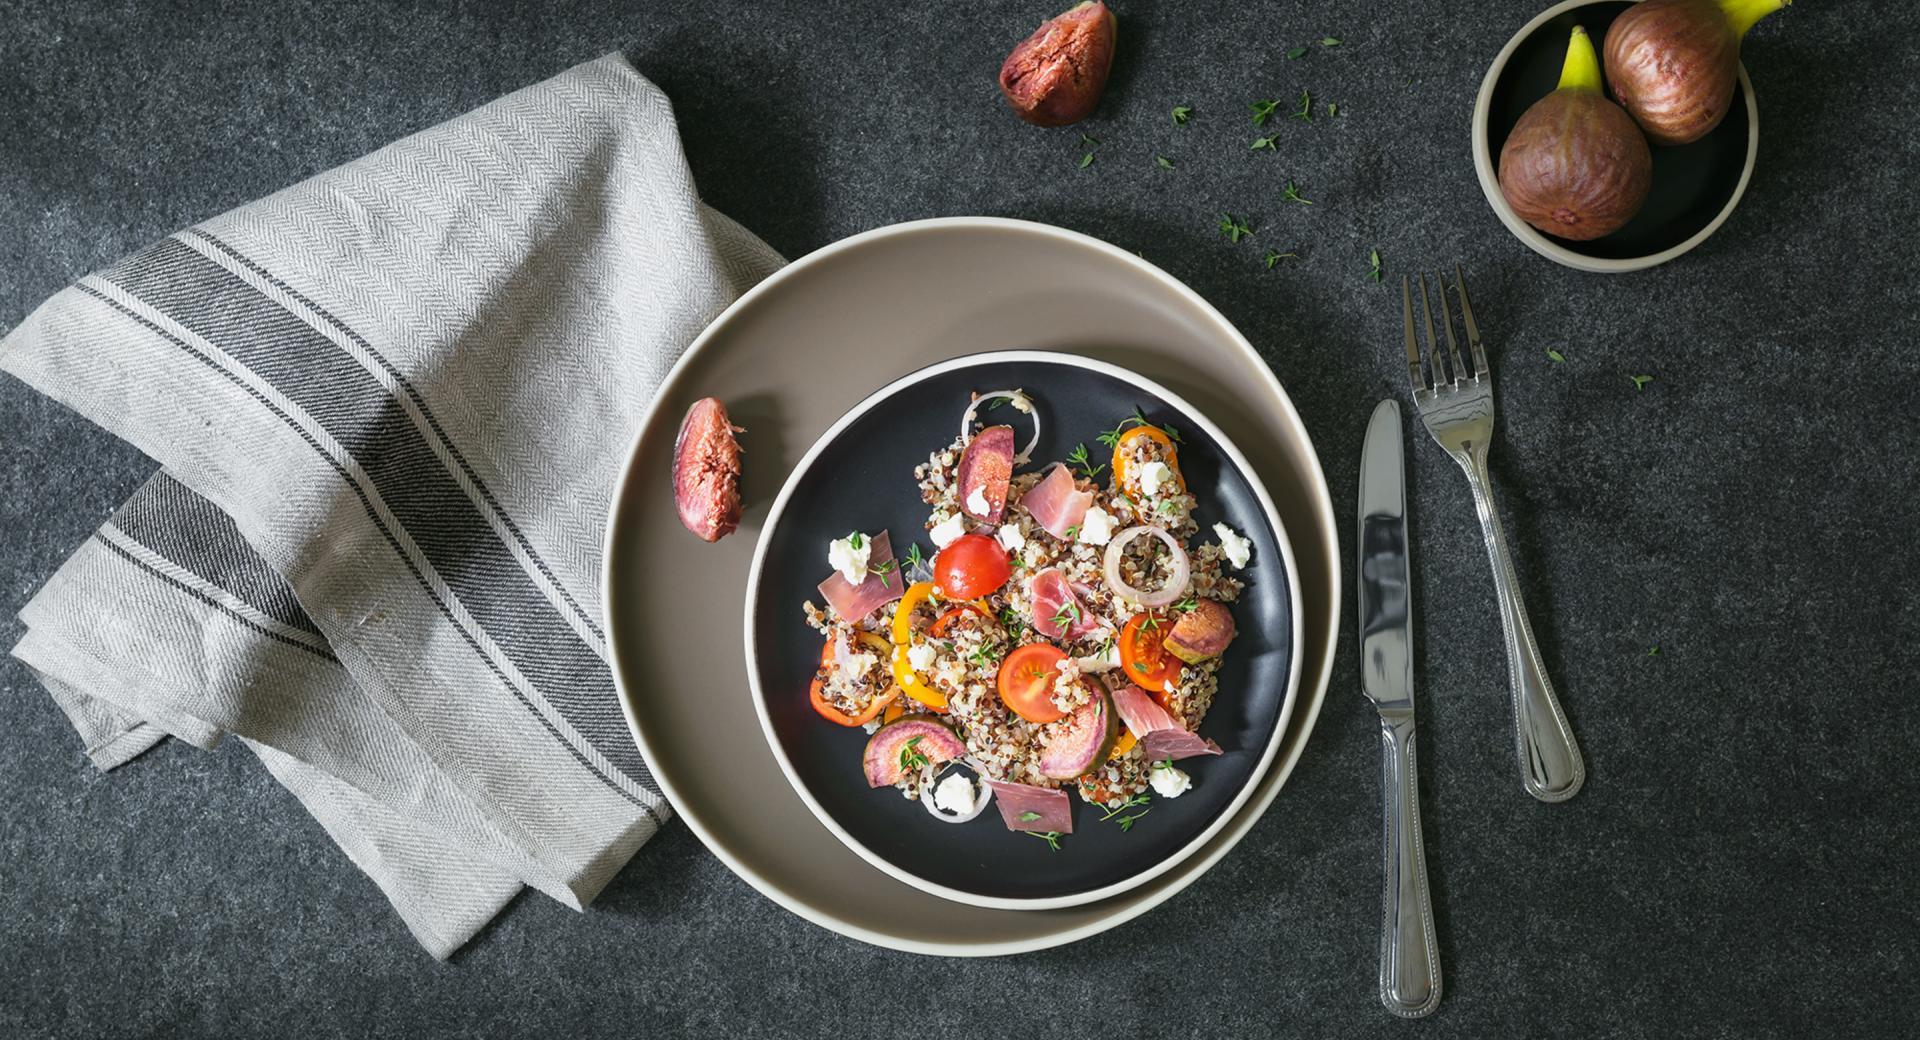 Ensalada veraniega de quinoa